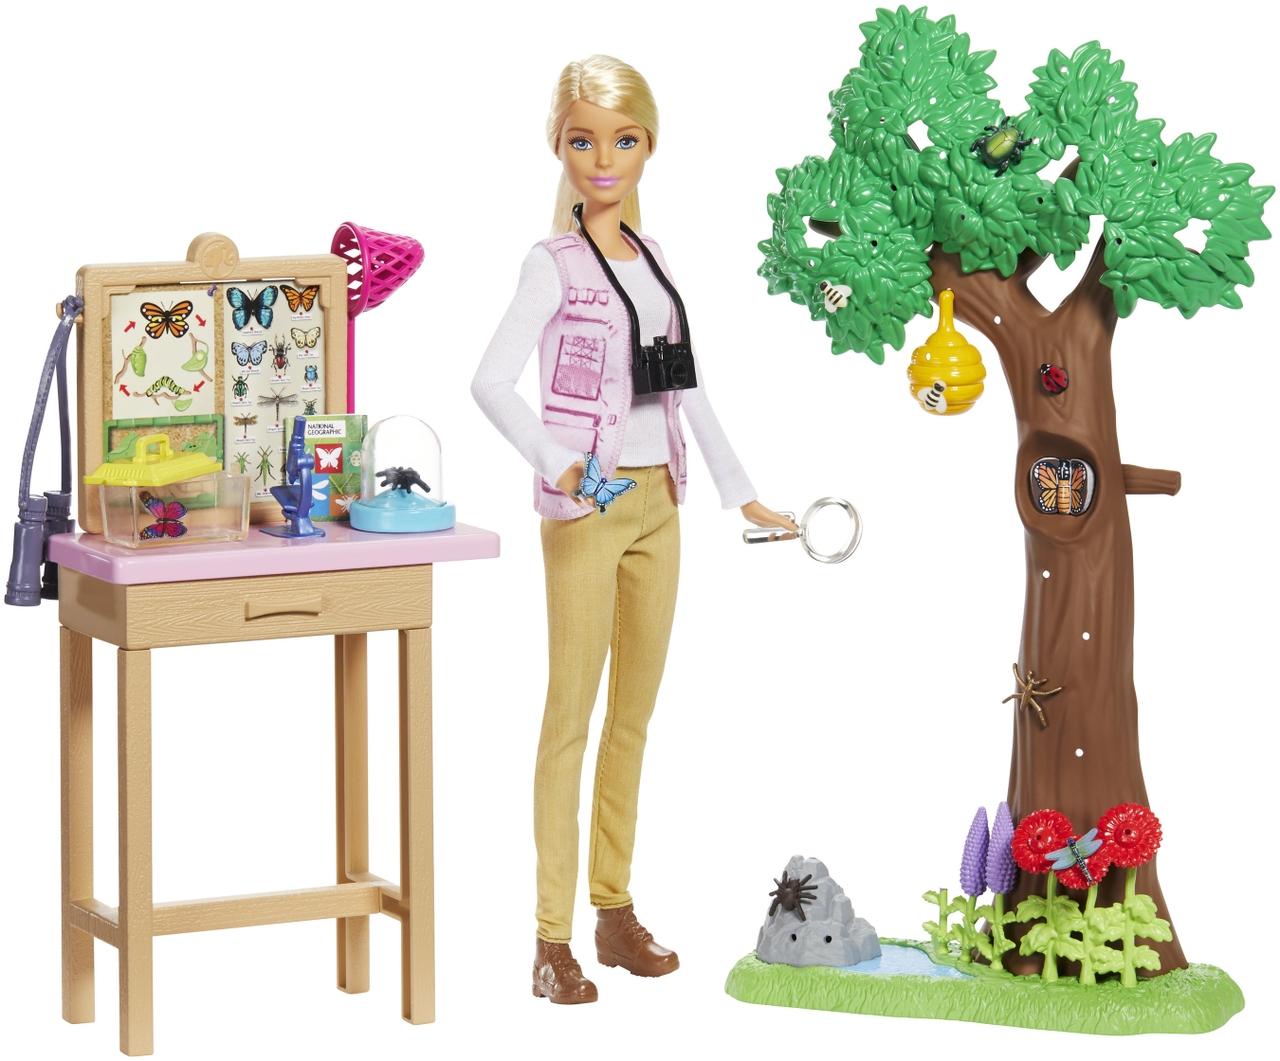 A Barbie figurine with accessories